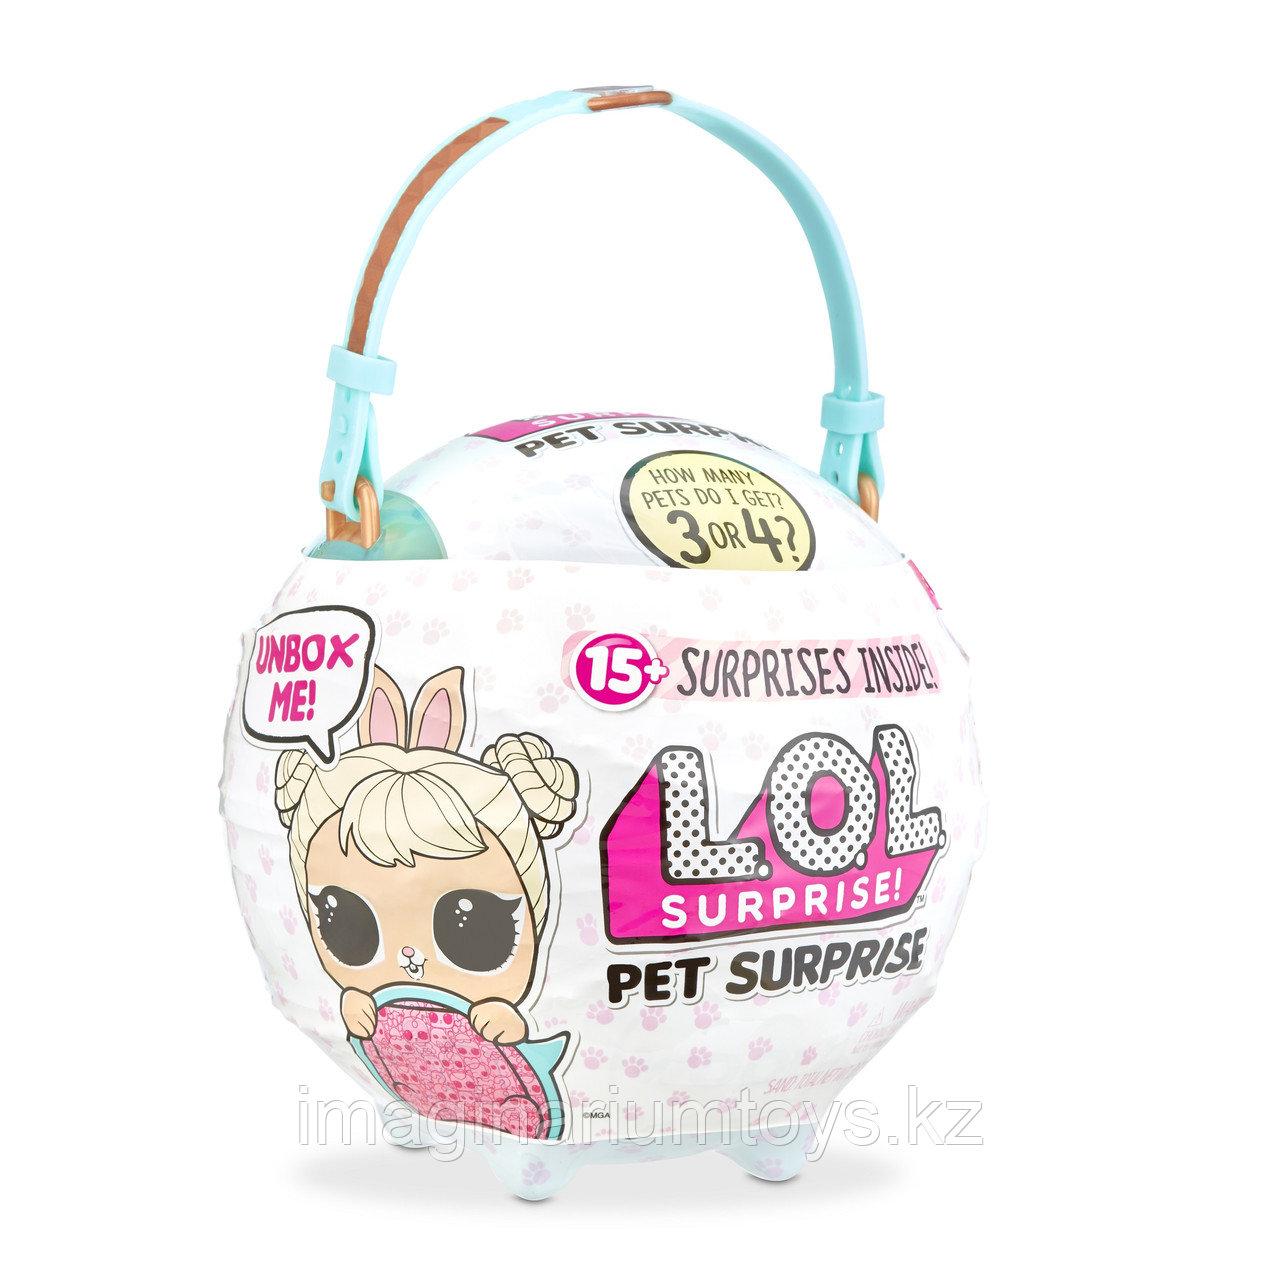 LOL Surprise Biggie Pet ЛОЛ Большой питомец кошечка Cottontail QT